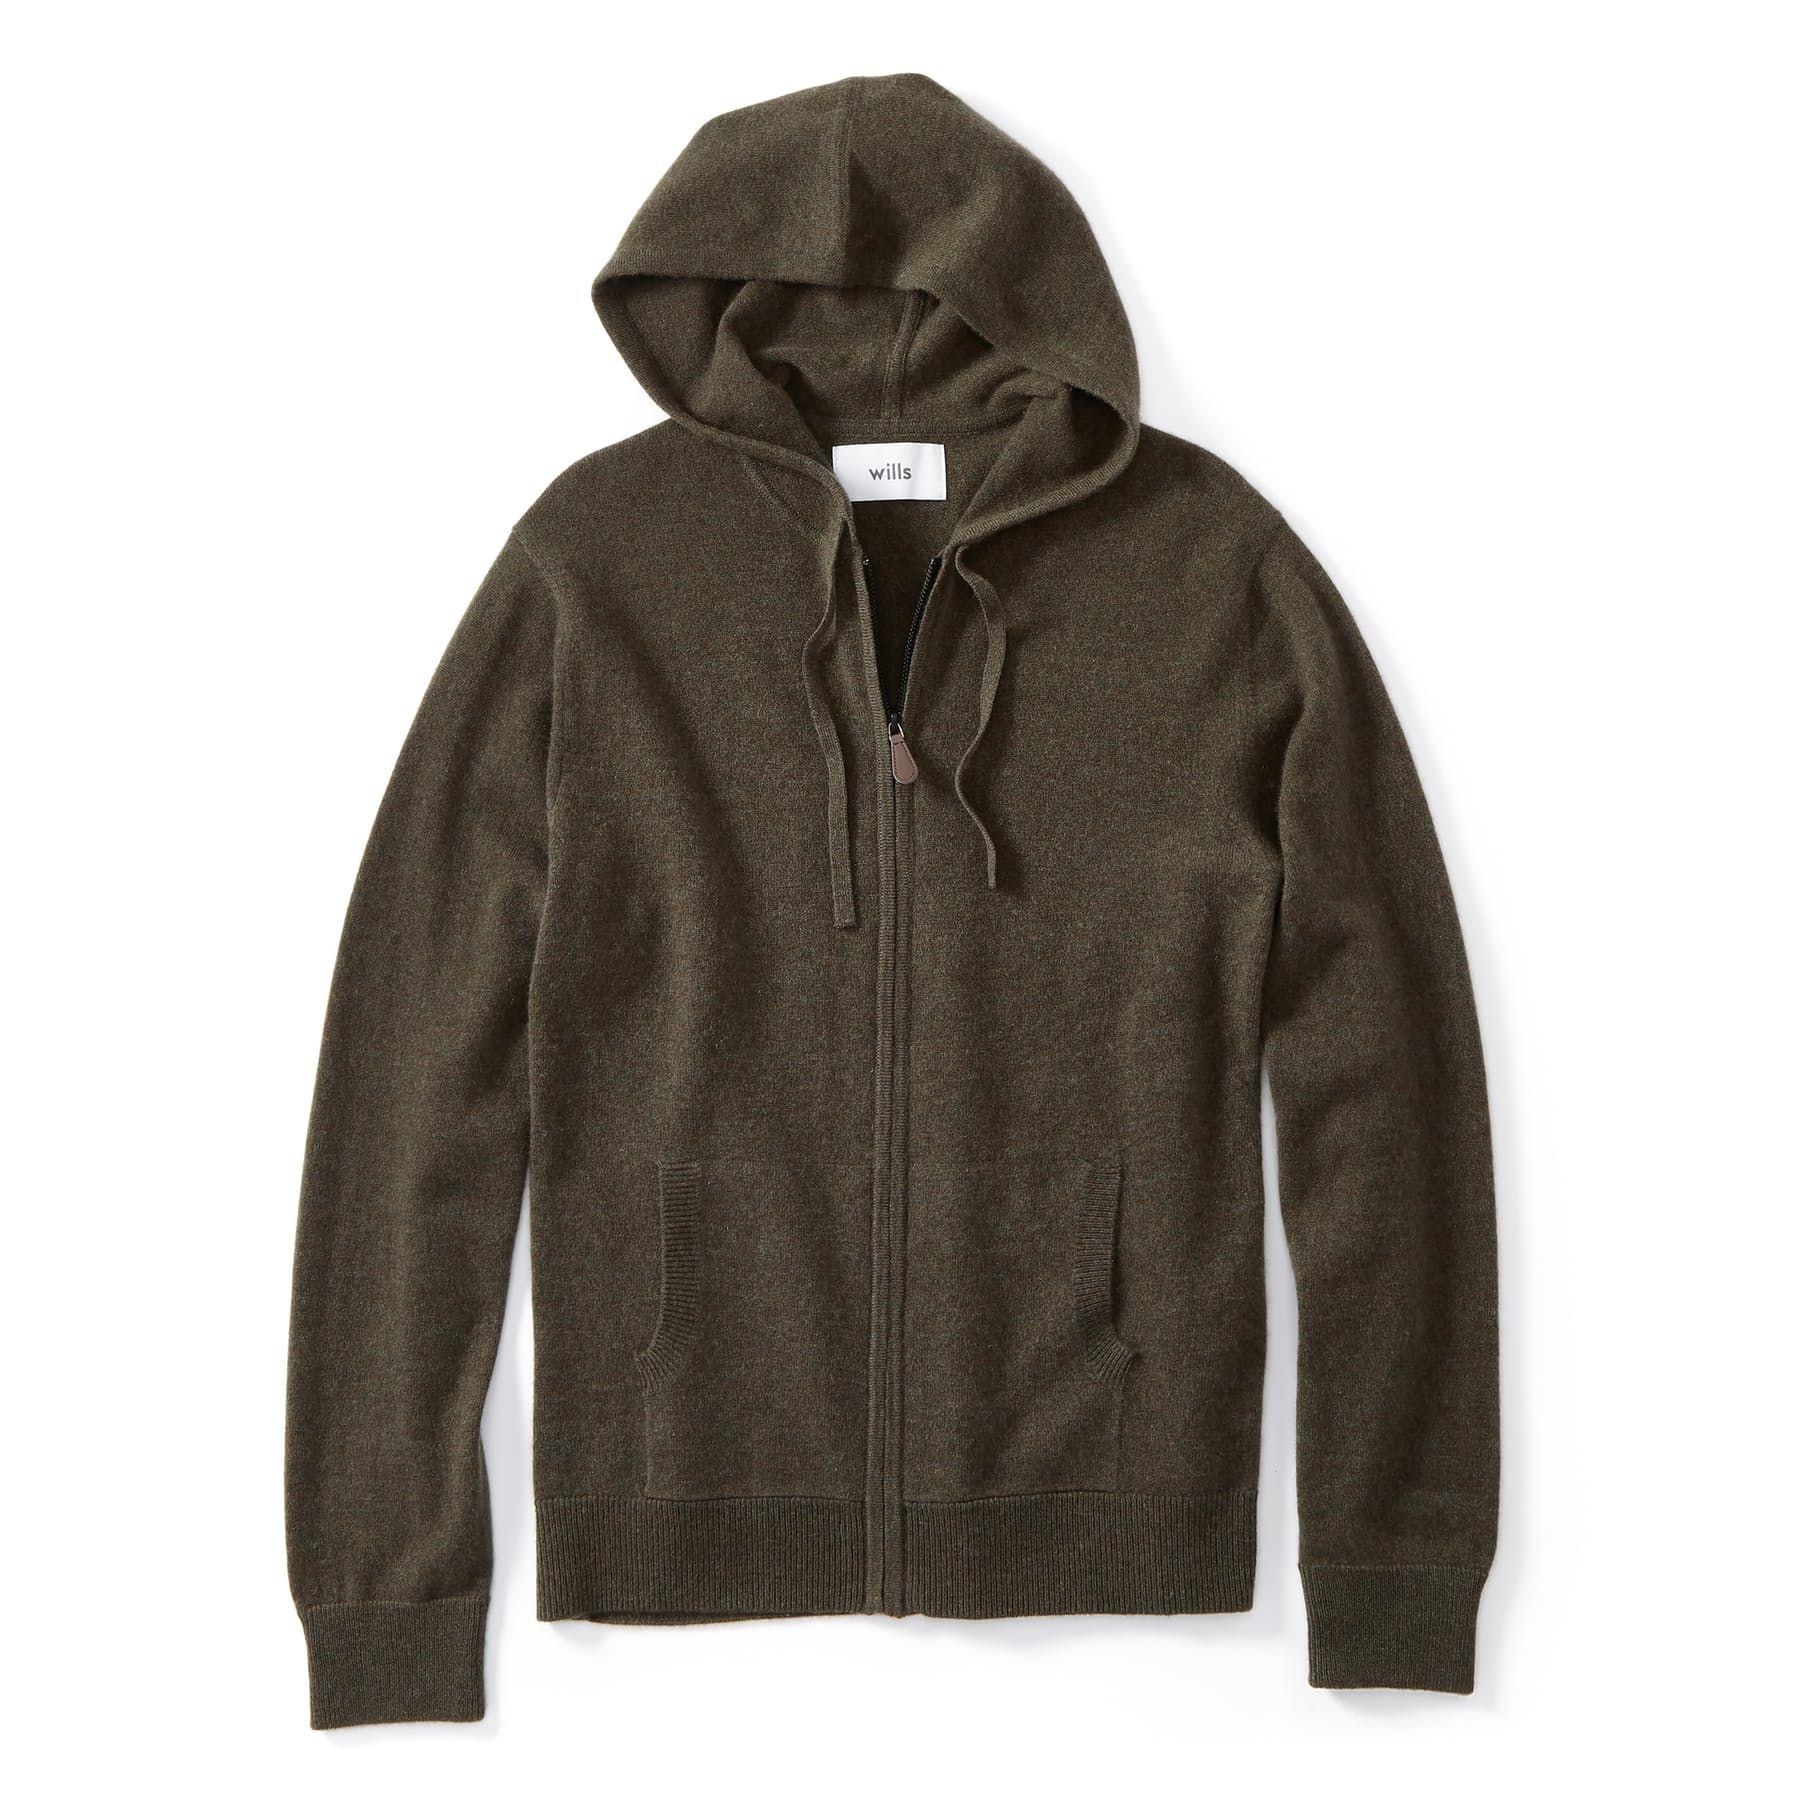 b8aa75e9759 50 Best Wardrobe Essentials for Men 2019 - Classic Closet Staples